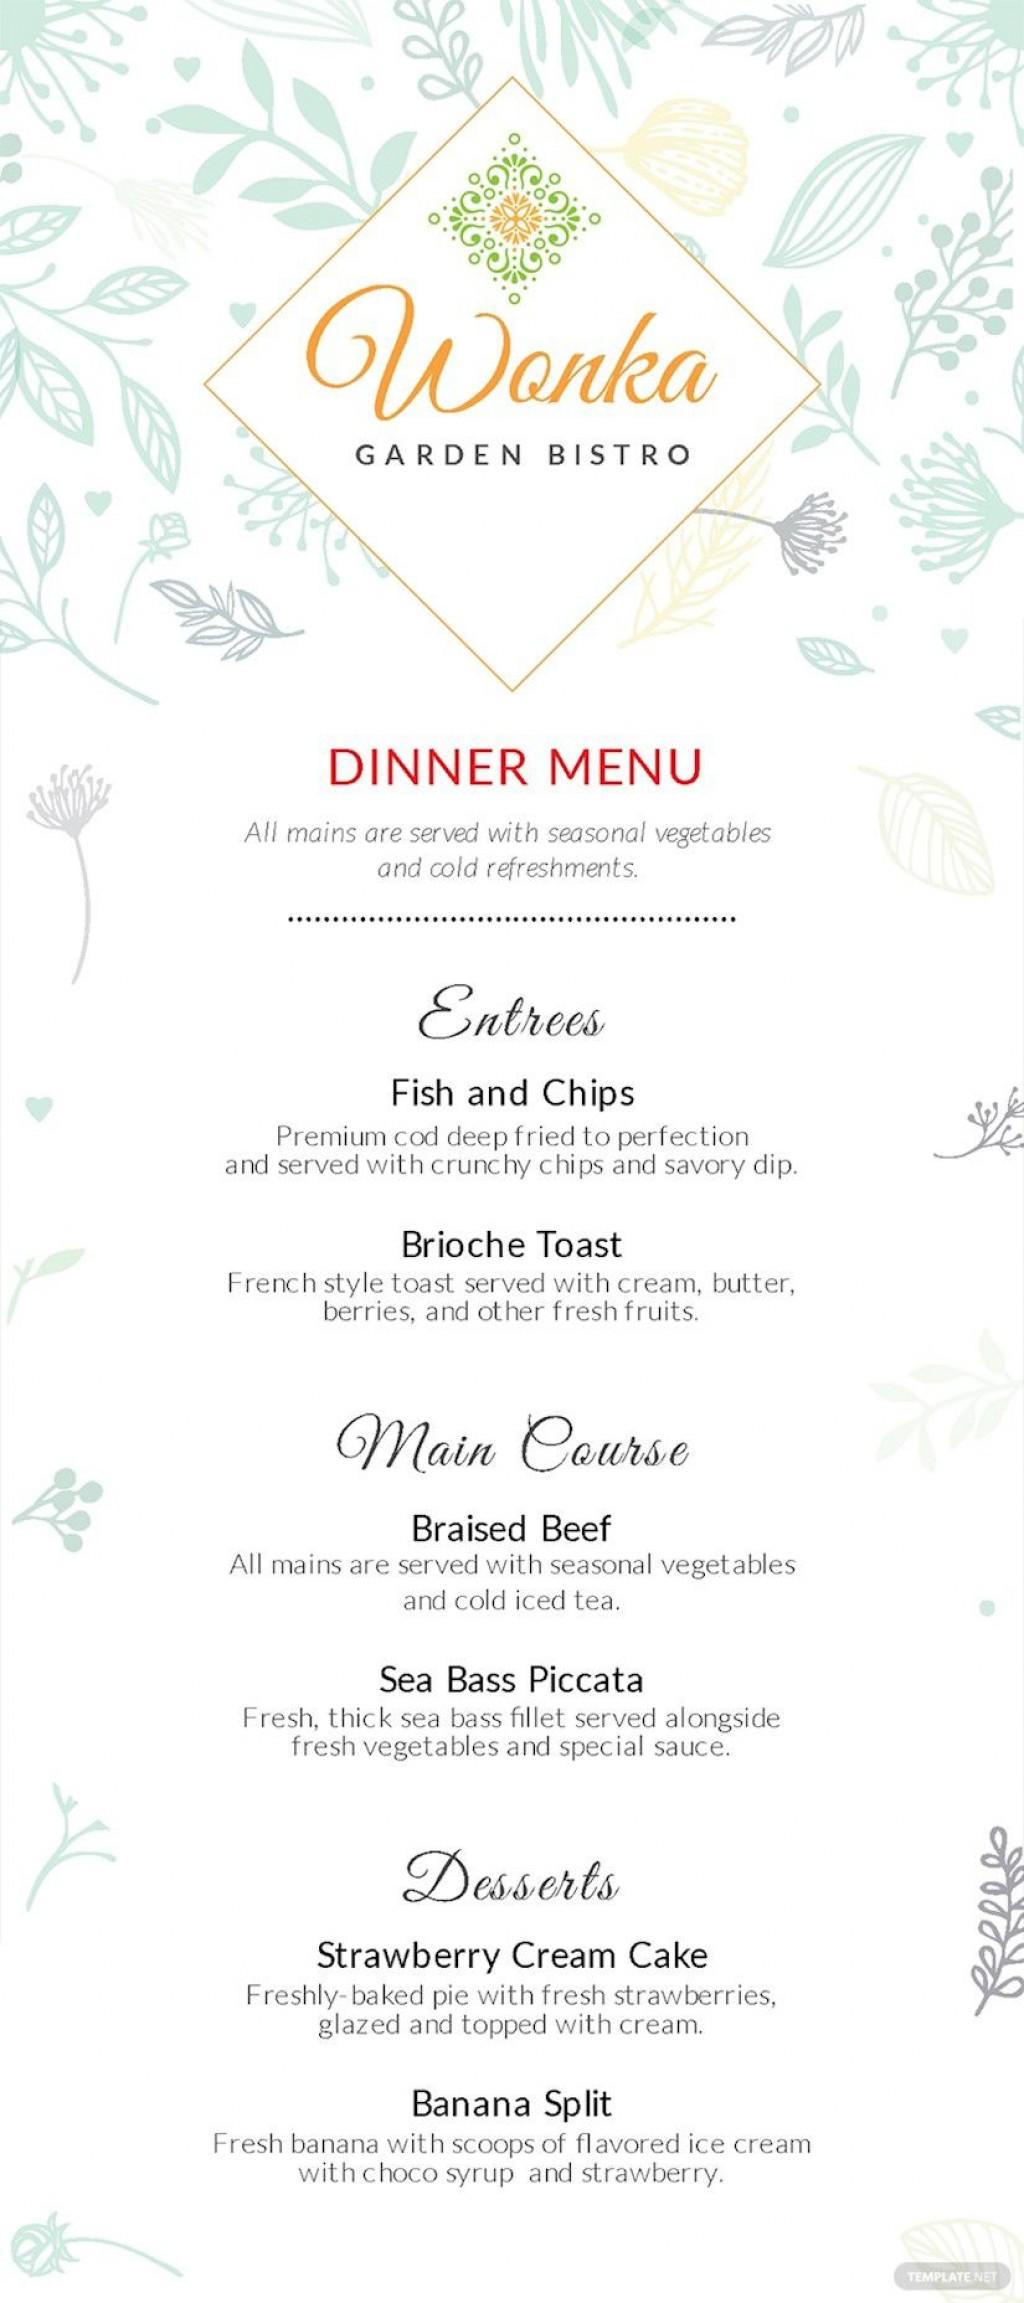 005 Shocking Dinner Party Menu Template High Def  Card Free Italian WordLarge